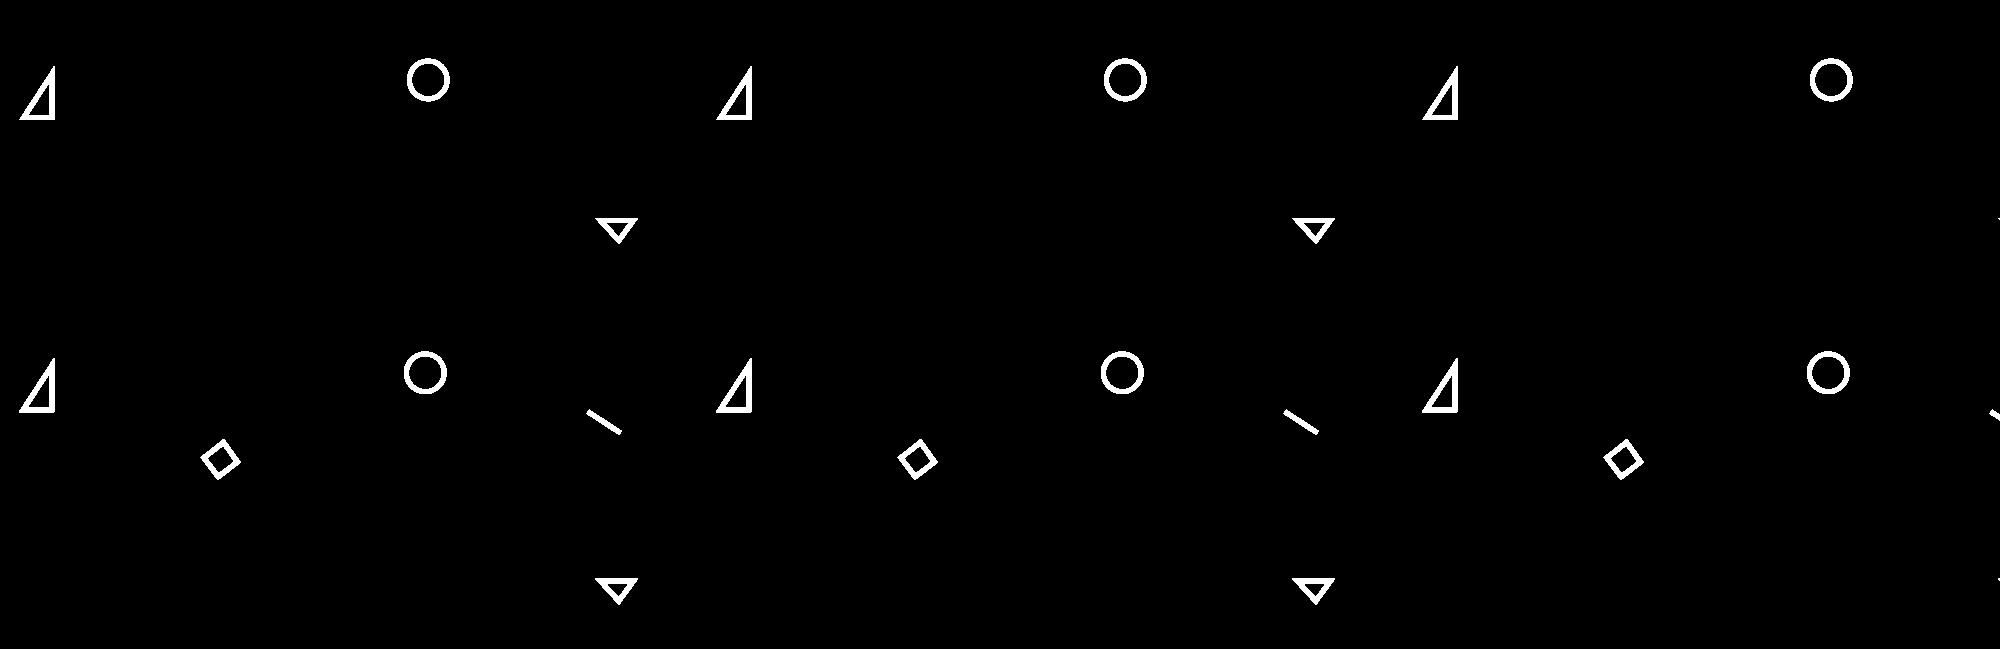 WECREATE_pattern_blurred_01